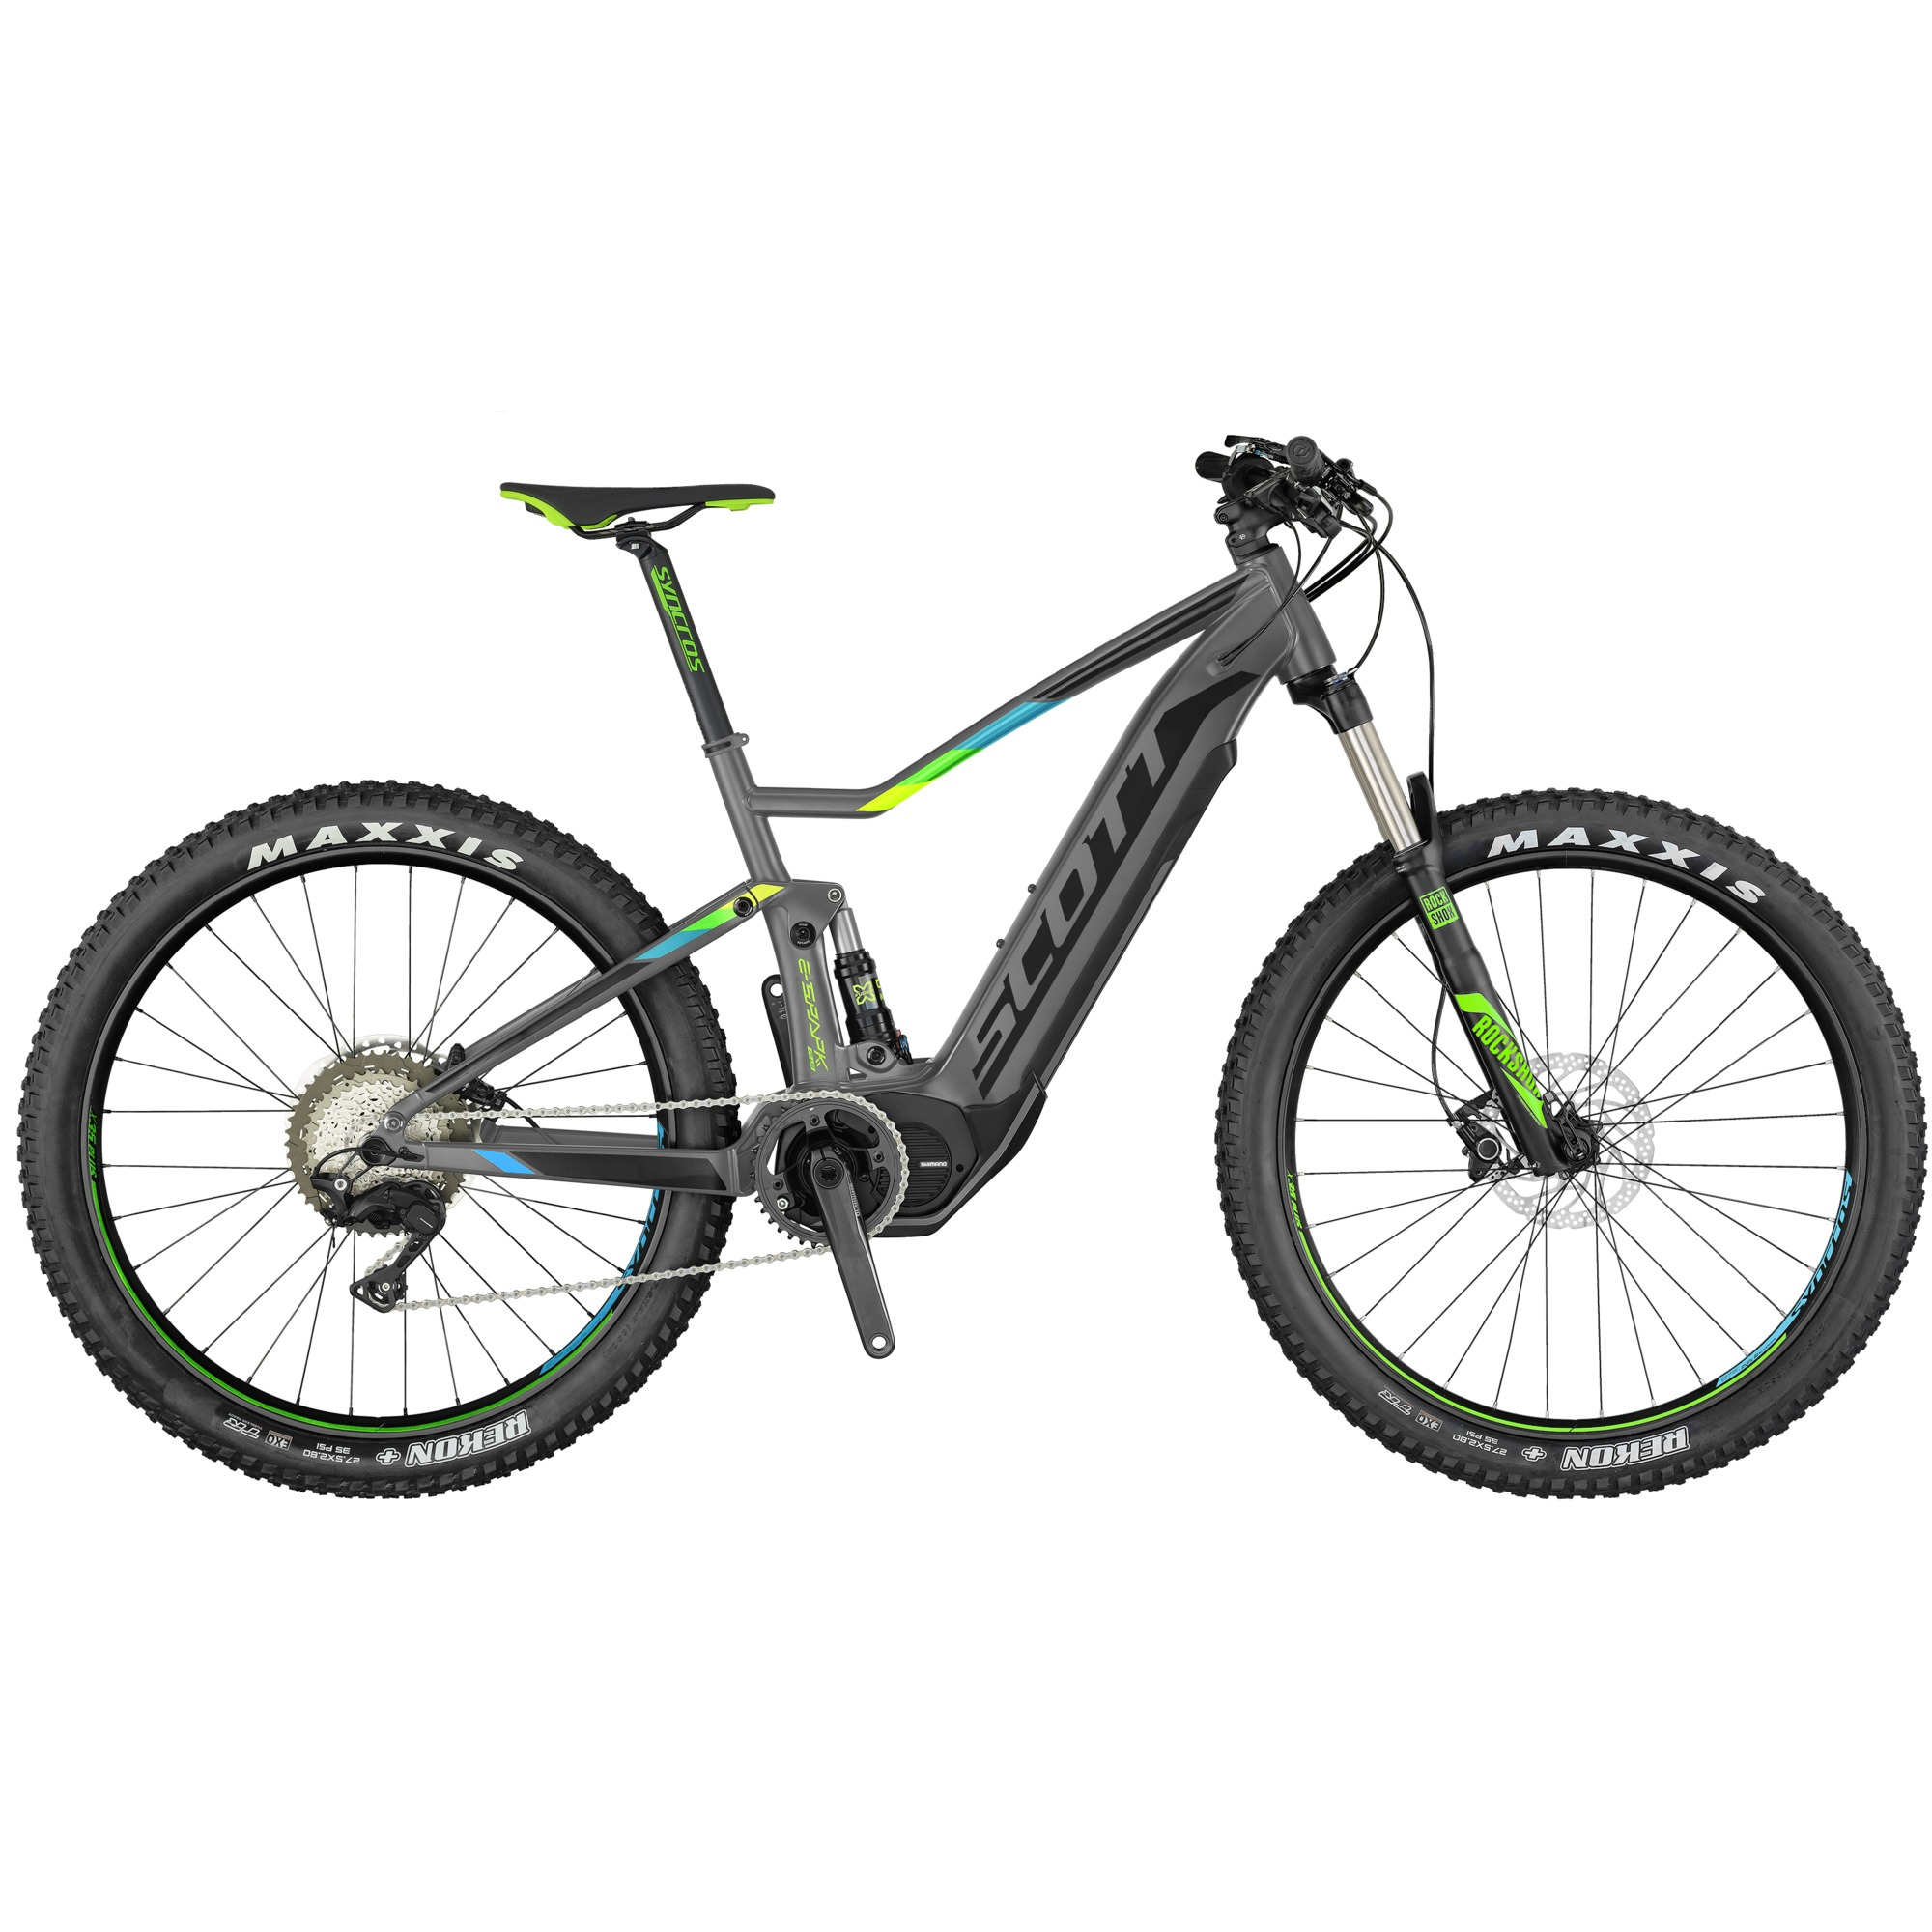 9066a5a2e36 2017 Scott E-Spark 720 Plus Electric Mountain Bike £4,199.00